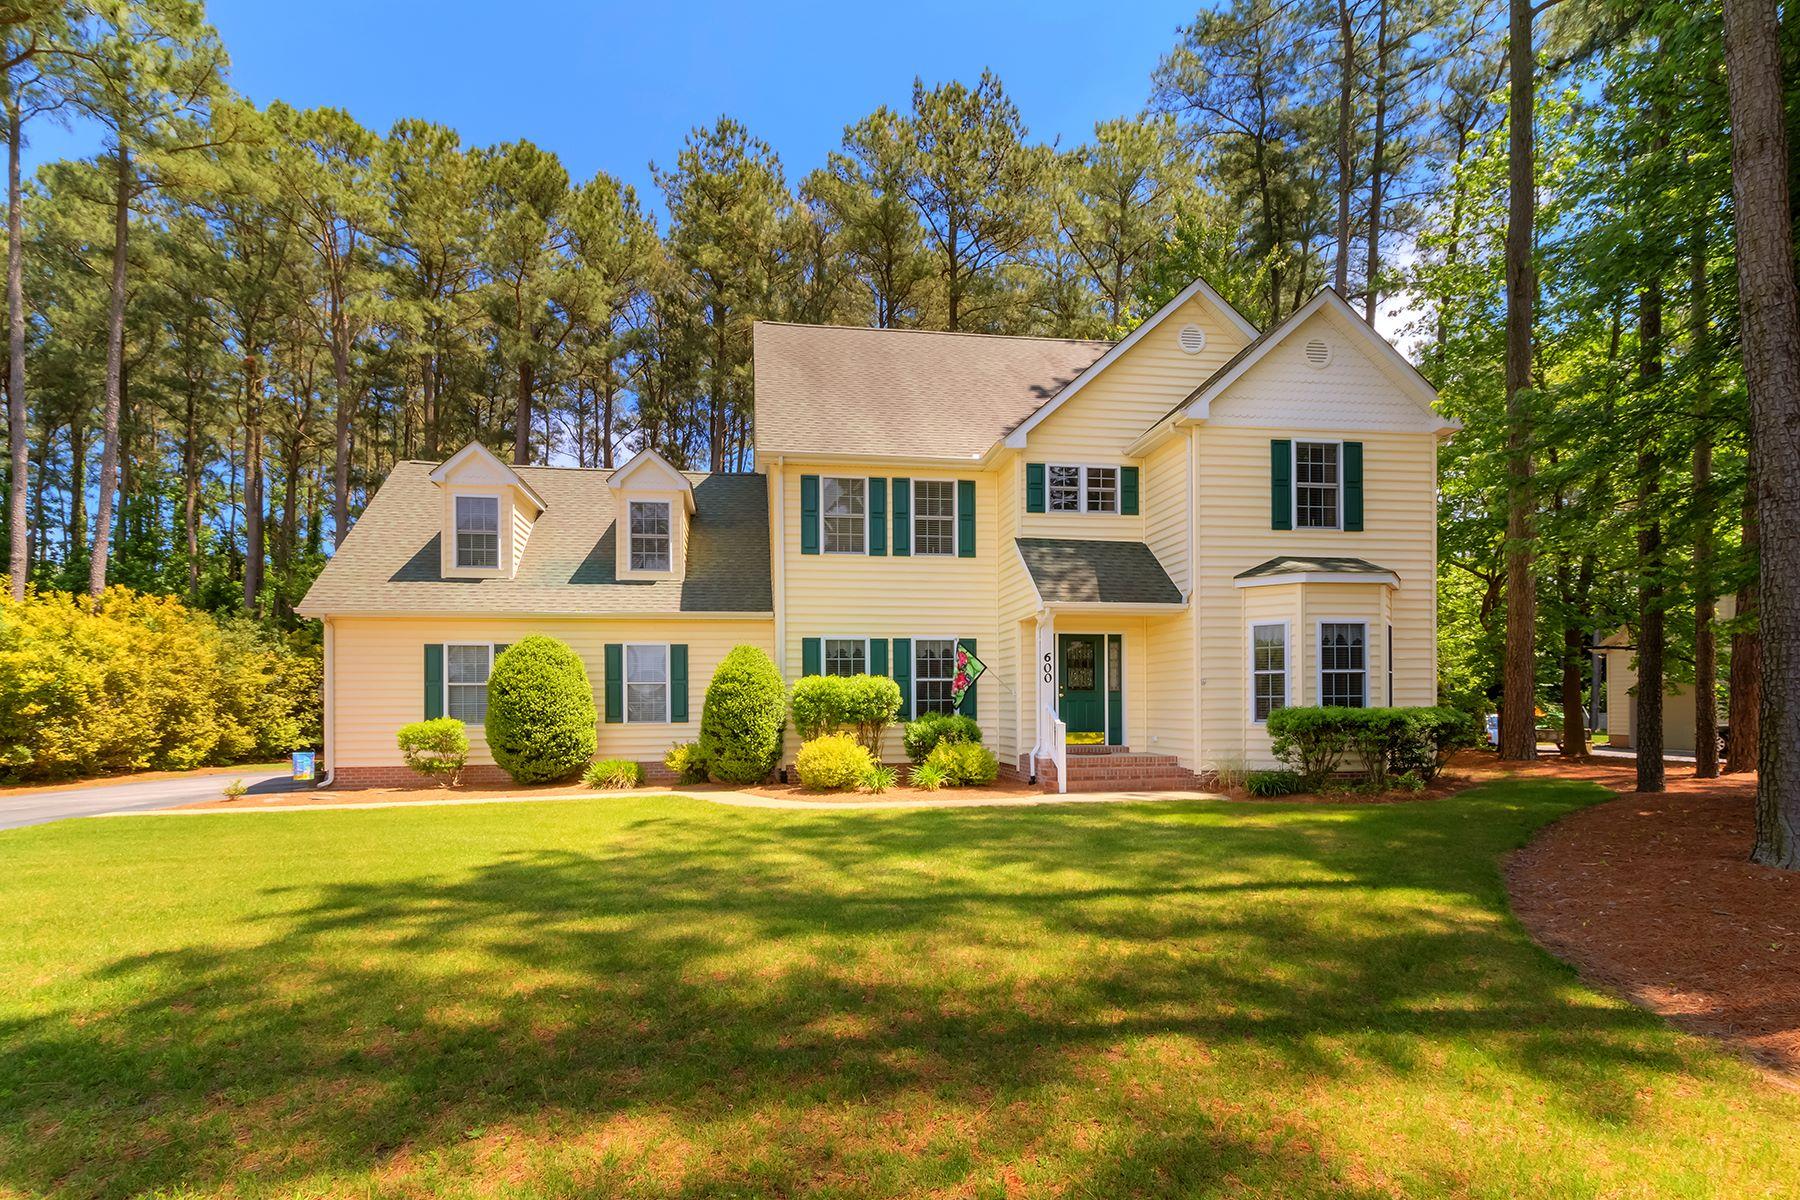 single family homes 为 销售 在 600 Wagamon Ave Extended , Georgetown, DE 19947 600 Wagamon Ave Extended 乔治城, 特拉华州 19947 美国